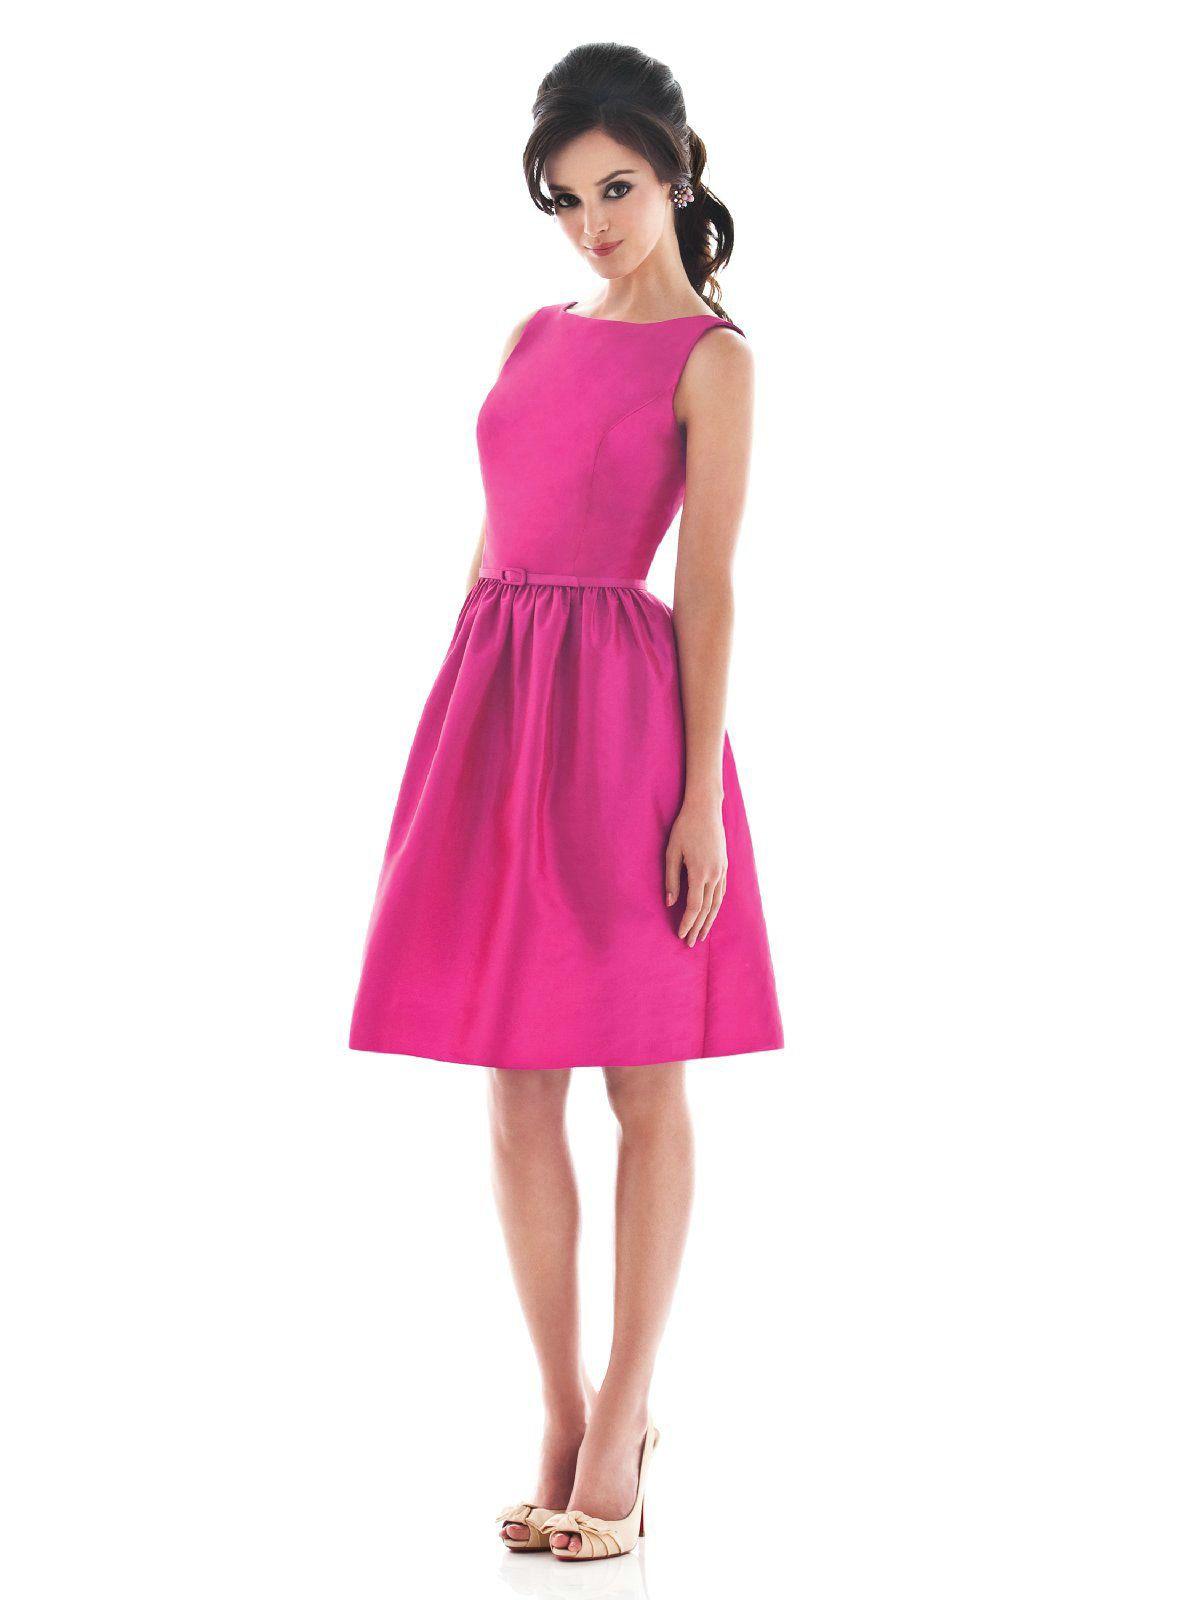 Sweetheart Short Modest Sweetheart Fuchsia Bridesmaid Dresses | Fab ...